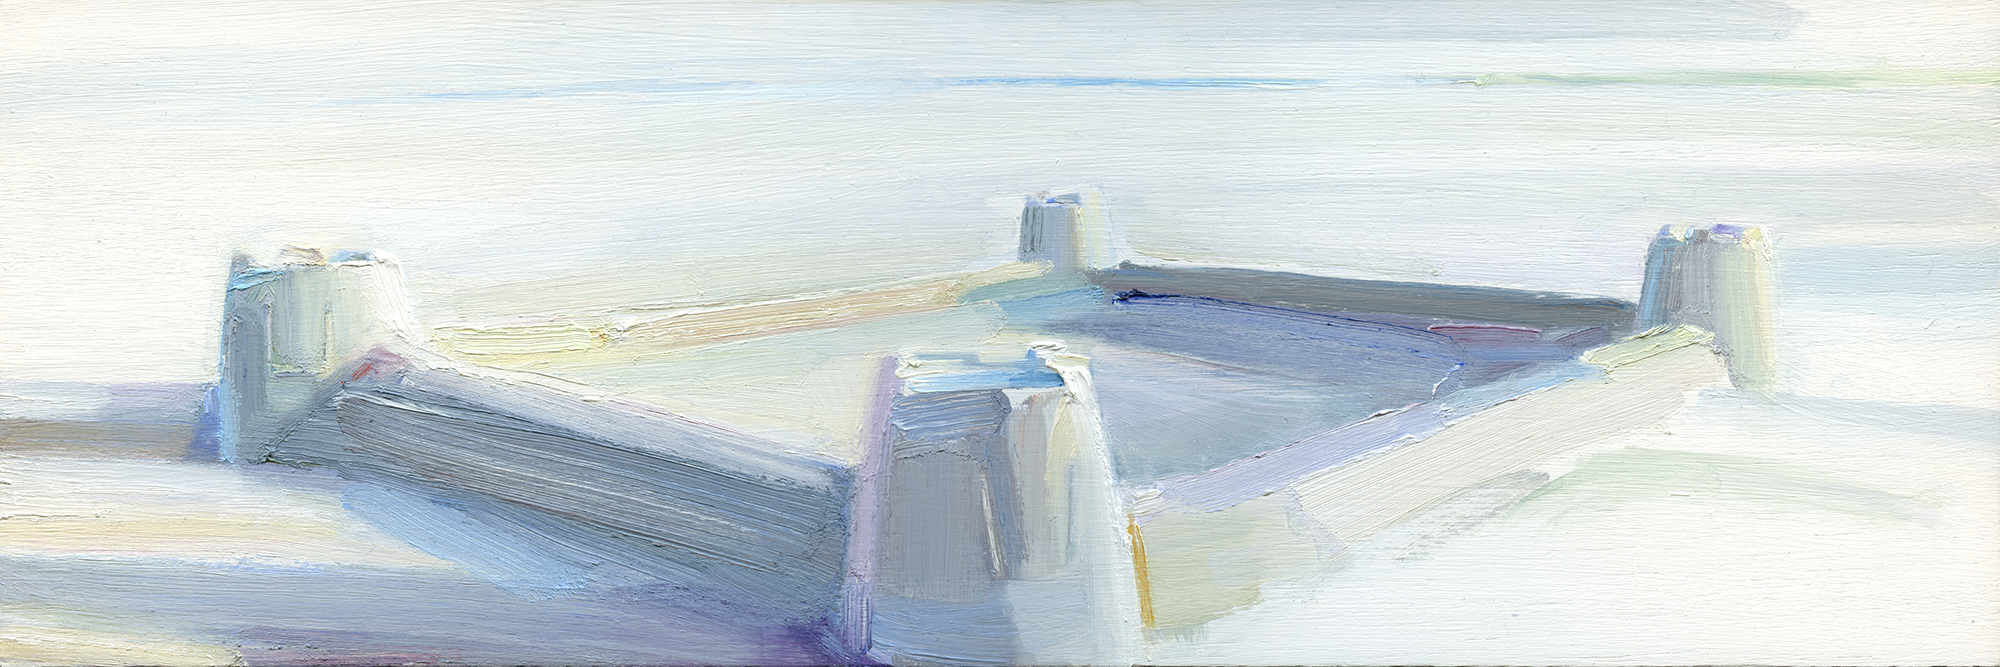 'Alnmouth Castle' oil on board 48cm x 16cm